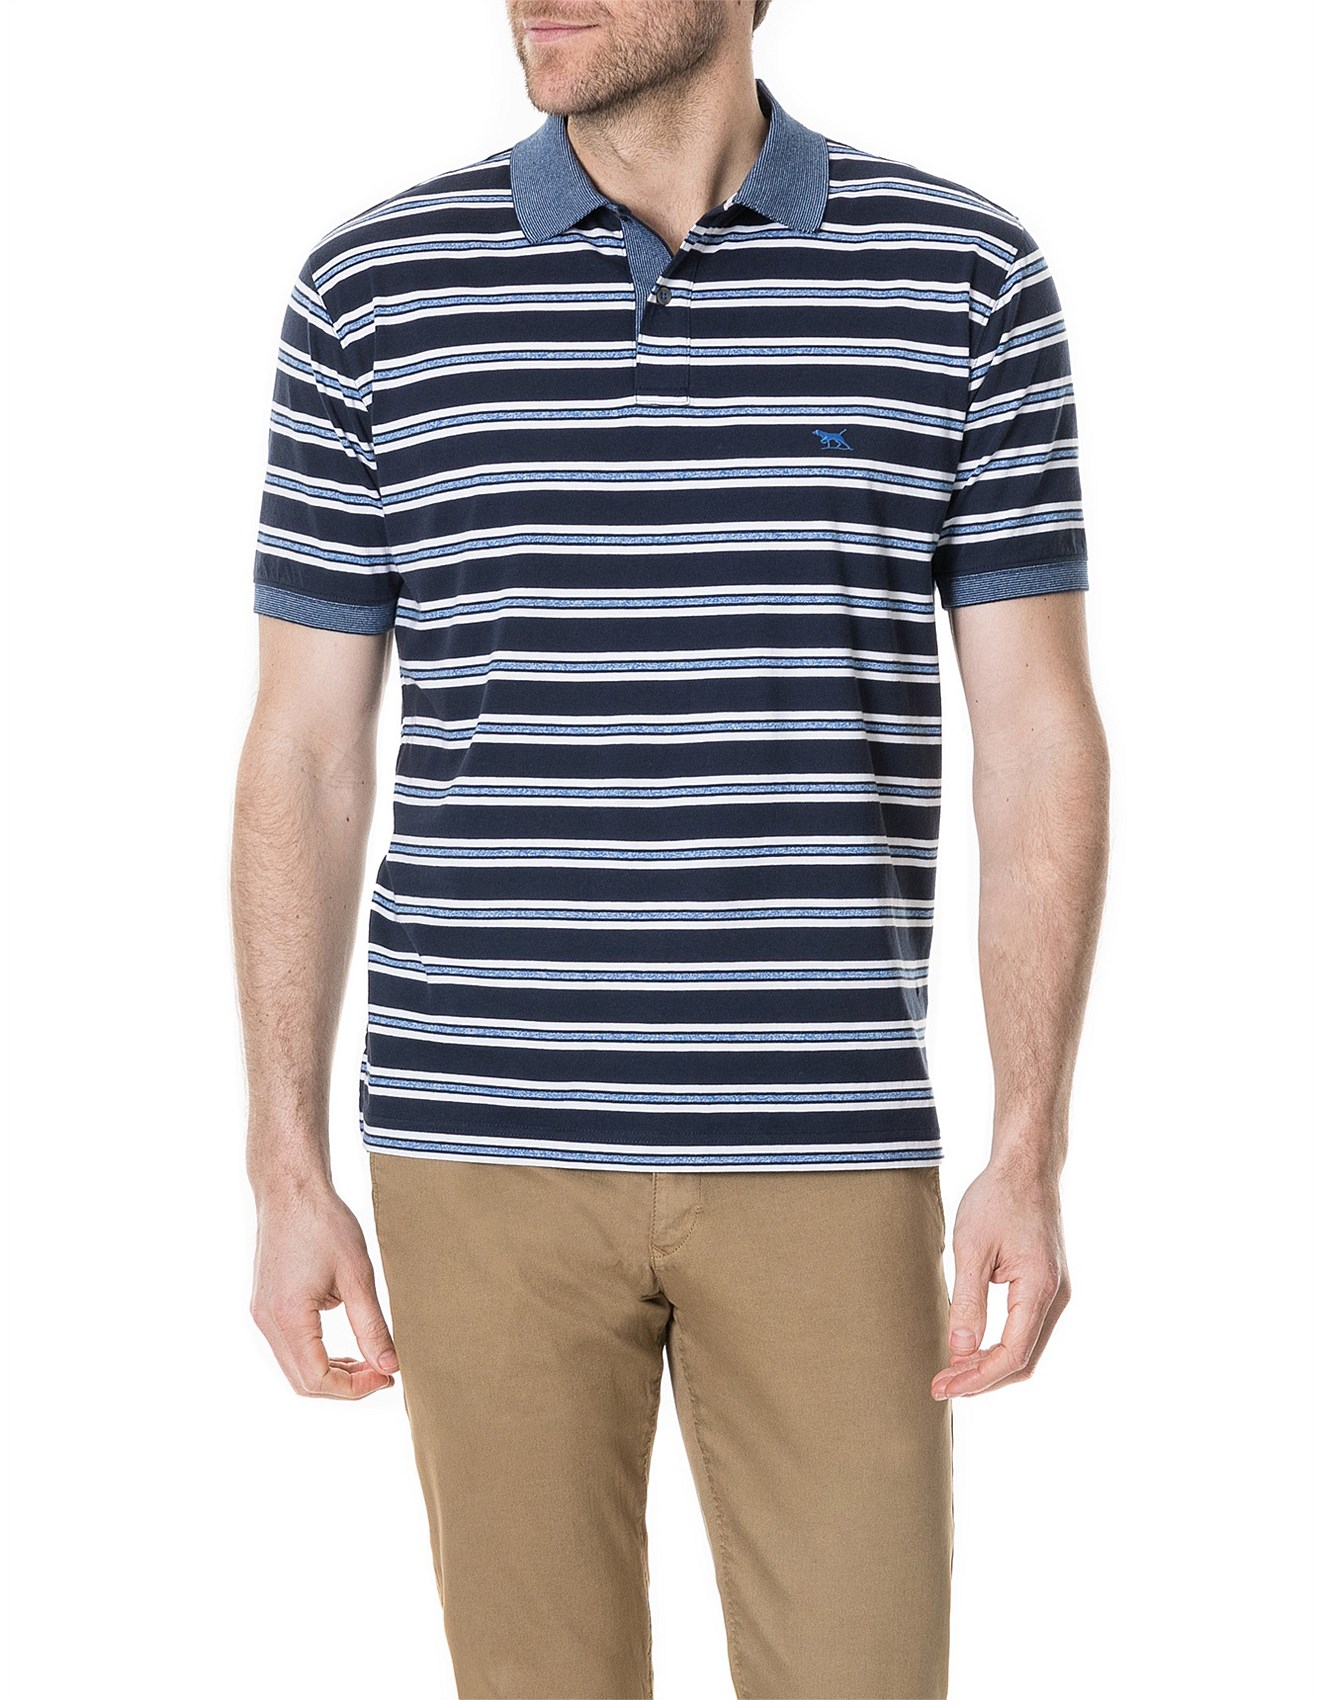 To Polo Shirts MeSaddha Buy Near Where Ybv7yf6g